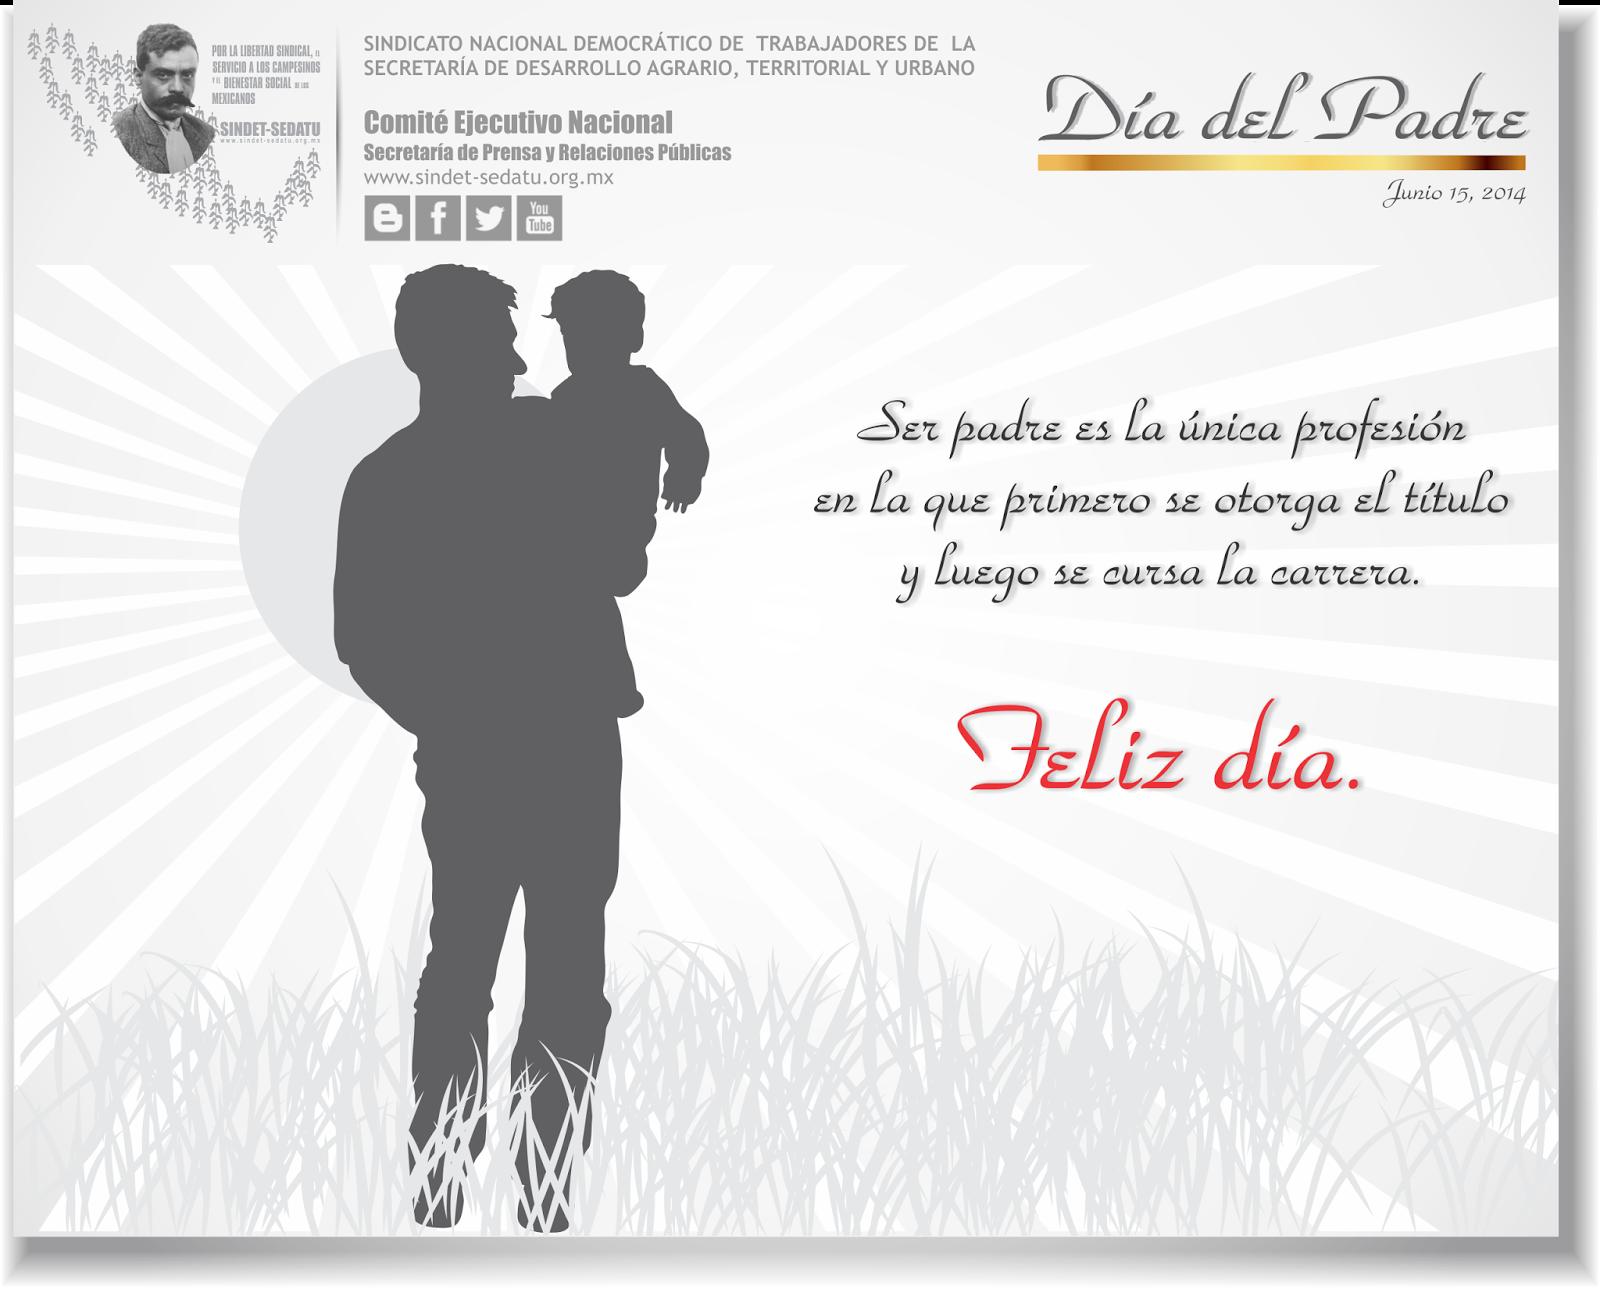 http://1.bp.blogspot.com/-owMFKe7ag-U/U51QUlRLd5I/AAAAAAAAFAA/V2bukul3cBA/s1600/D%C3%ADa+del+Padre+2014.png